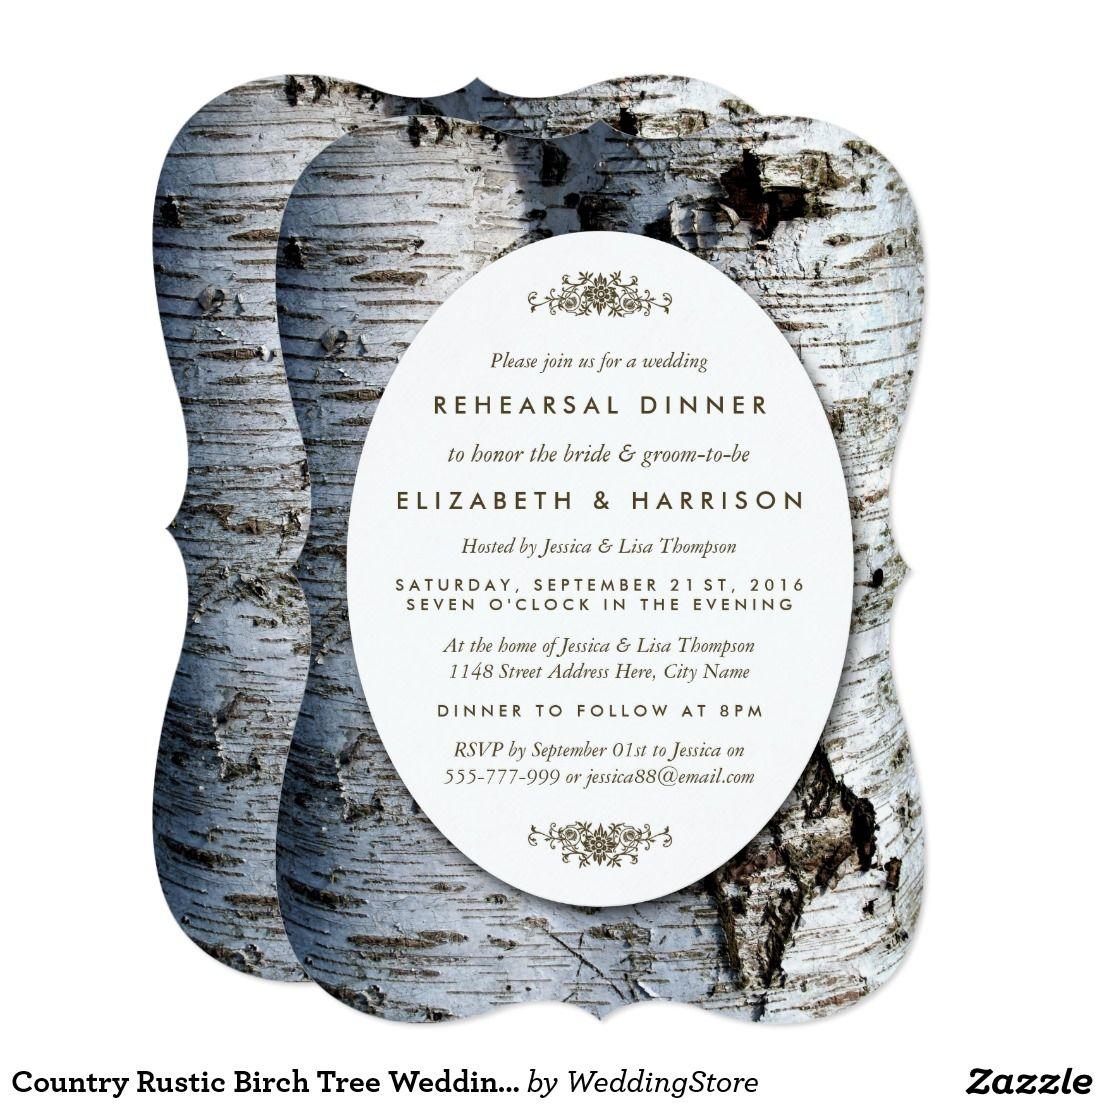 Country Rustic Birch Tree Wedding Rehearsal Dinner Card